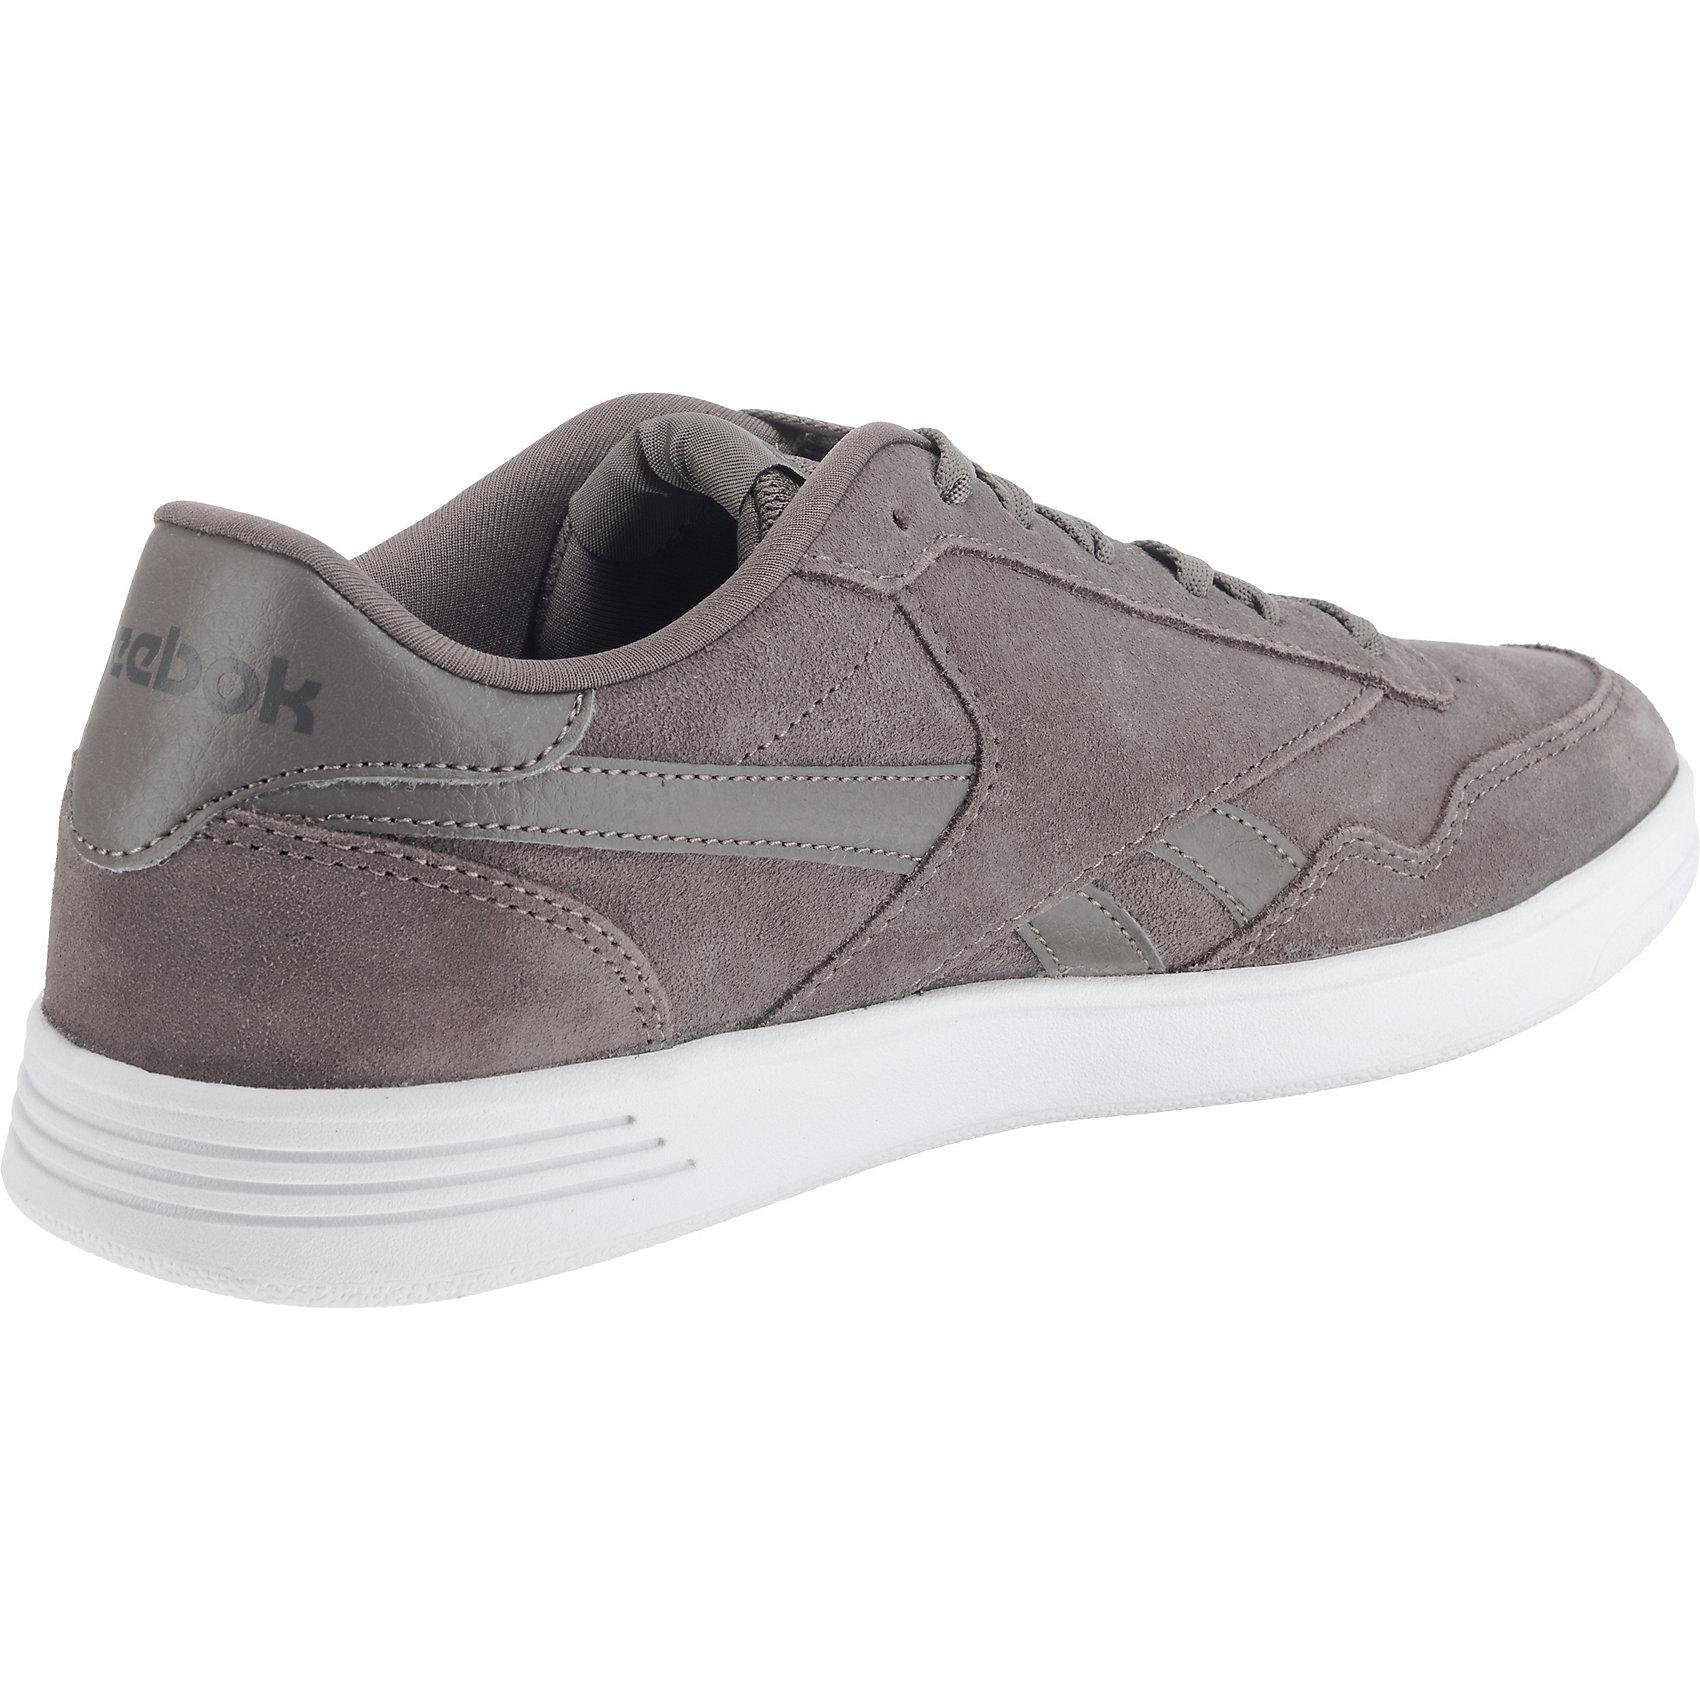 Neu-Reebok-ROYAL-TECHQUE-T-LX-Sneakers-Low-7408016-fuer-Herren-grau